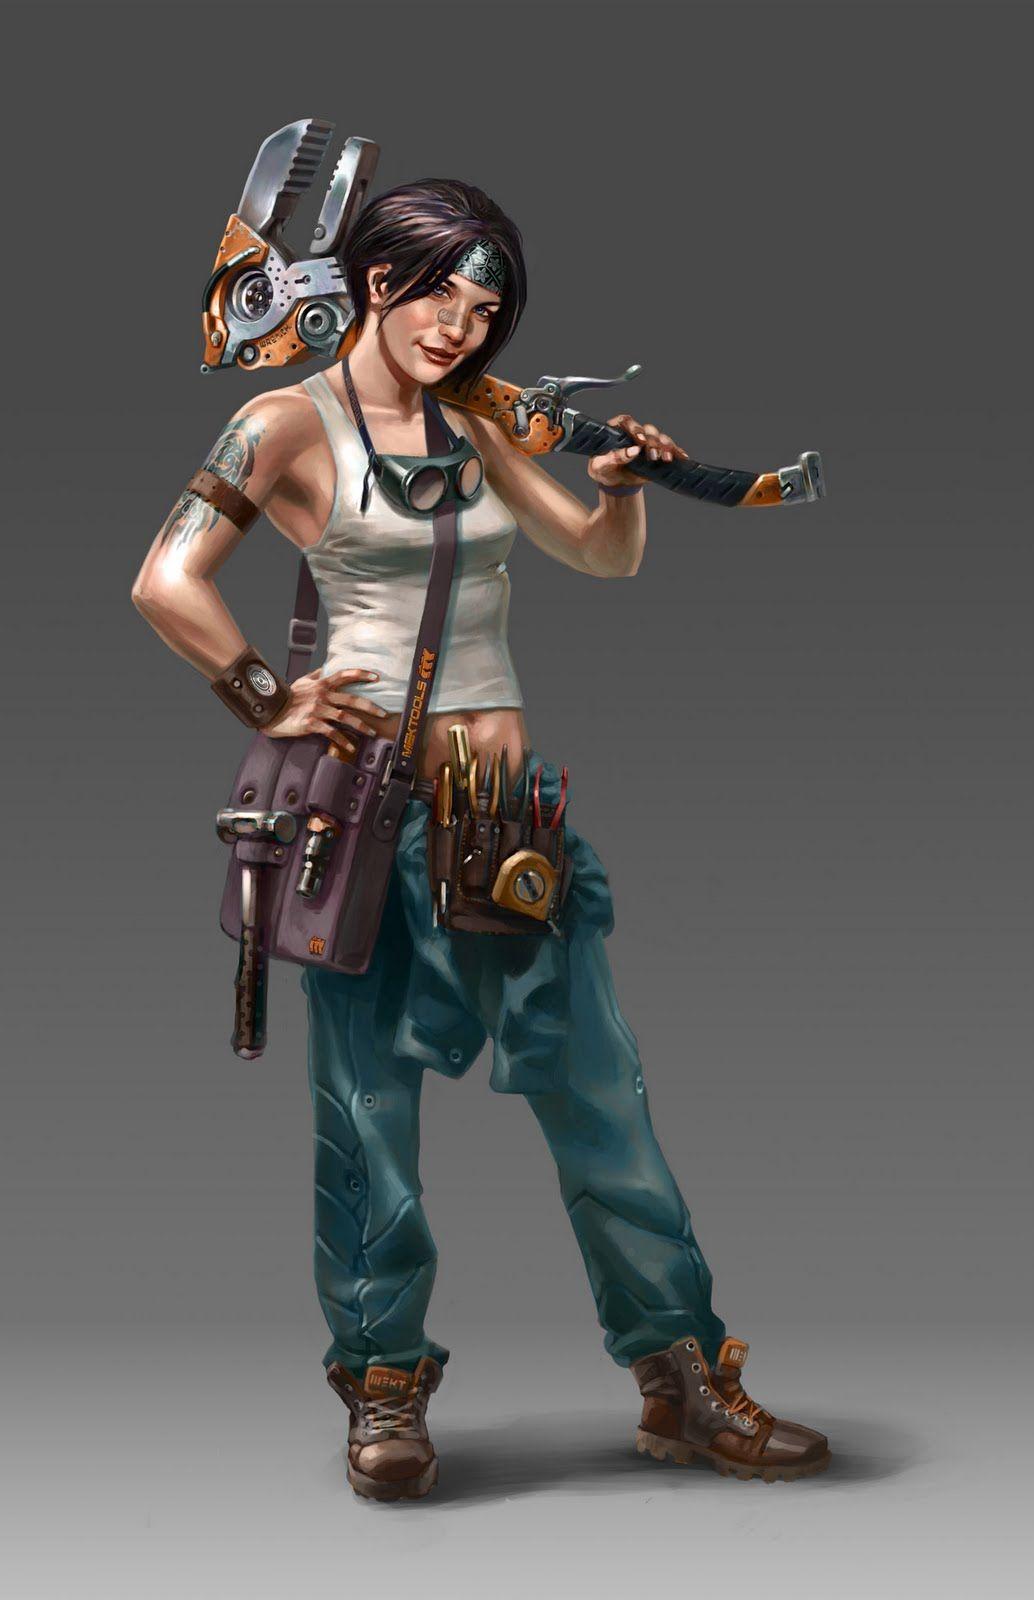 Female Mechanic Art